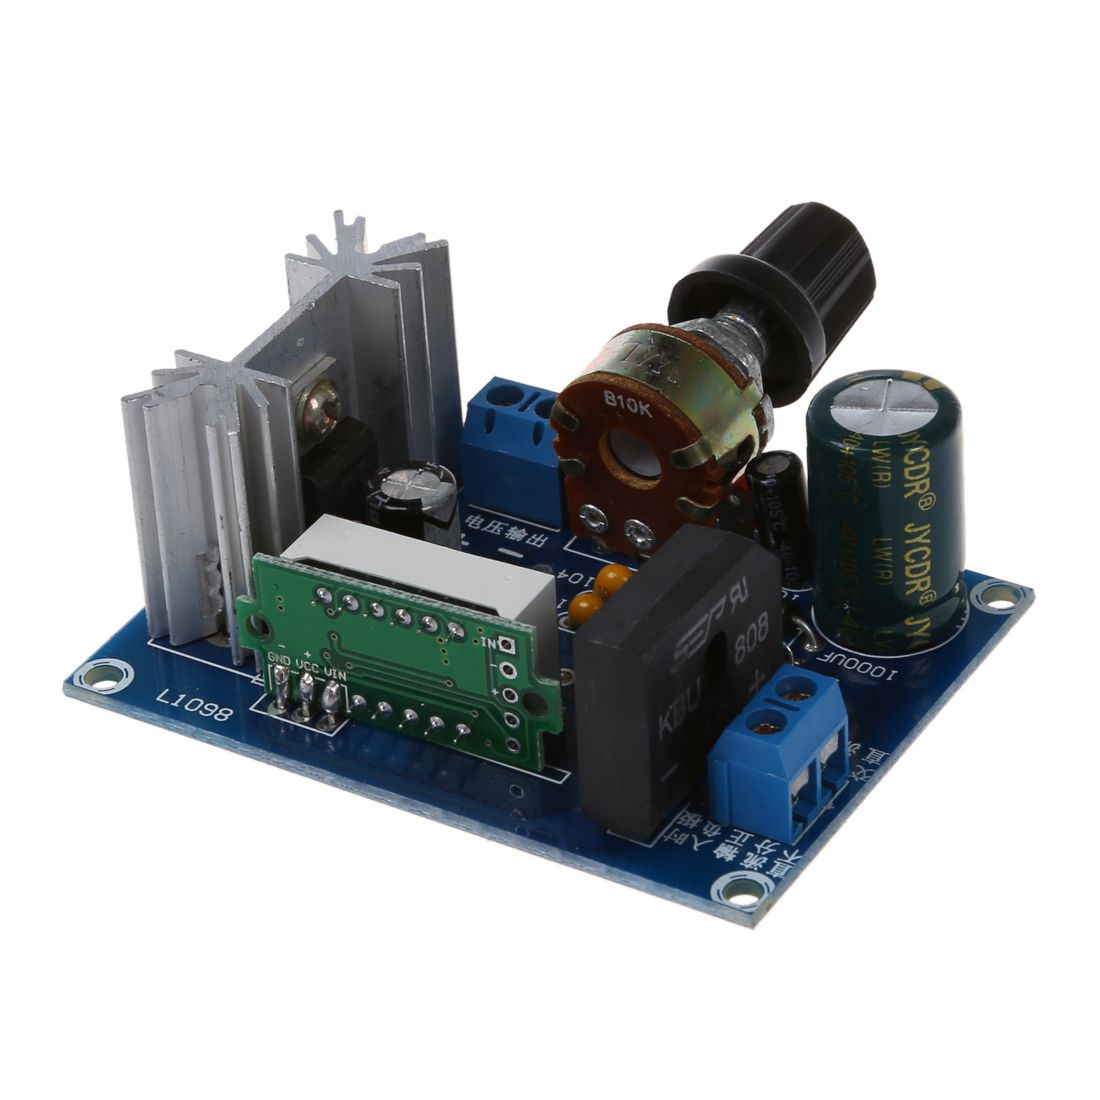 Lm317 Adjustable Voltage Regulator Step Down Power Supply Module Led 125v To 25v 15a Meter In Regulators Stabilizers From Home Improvement On